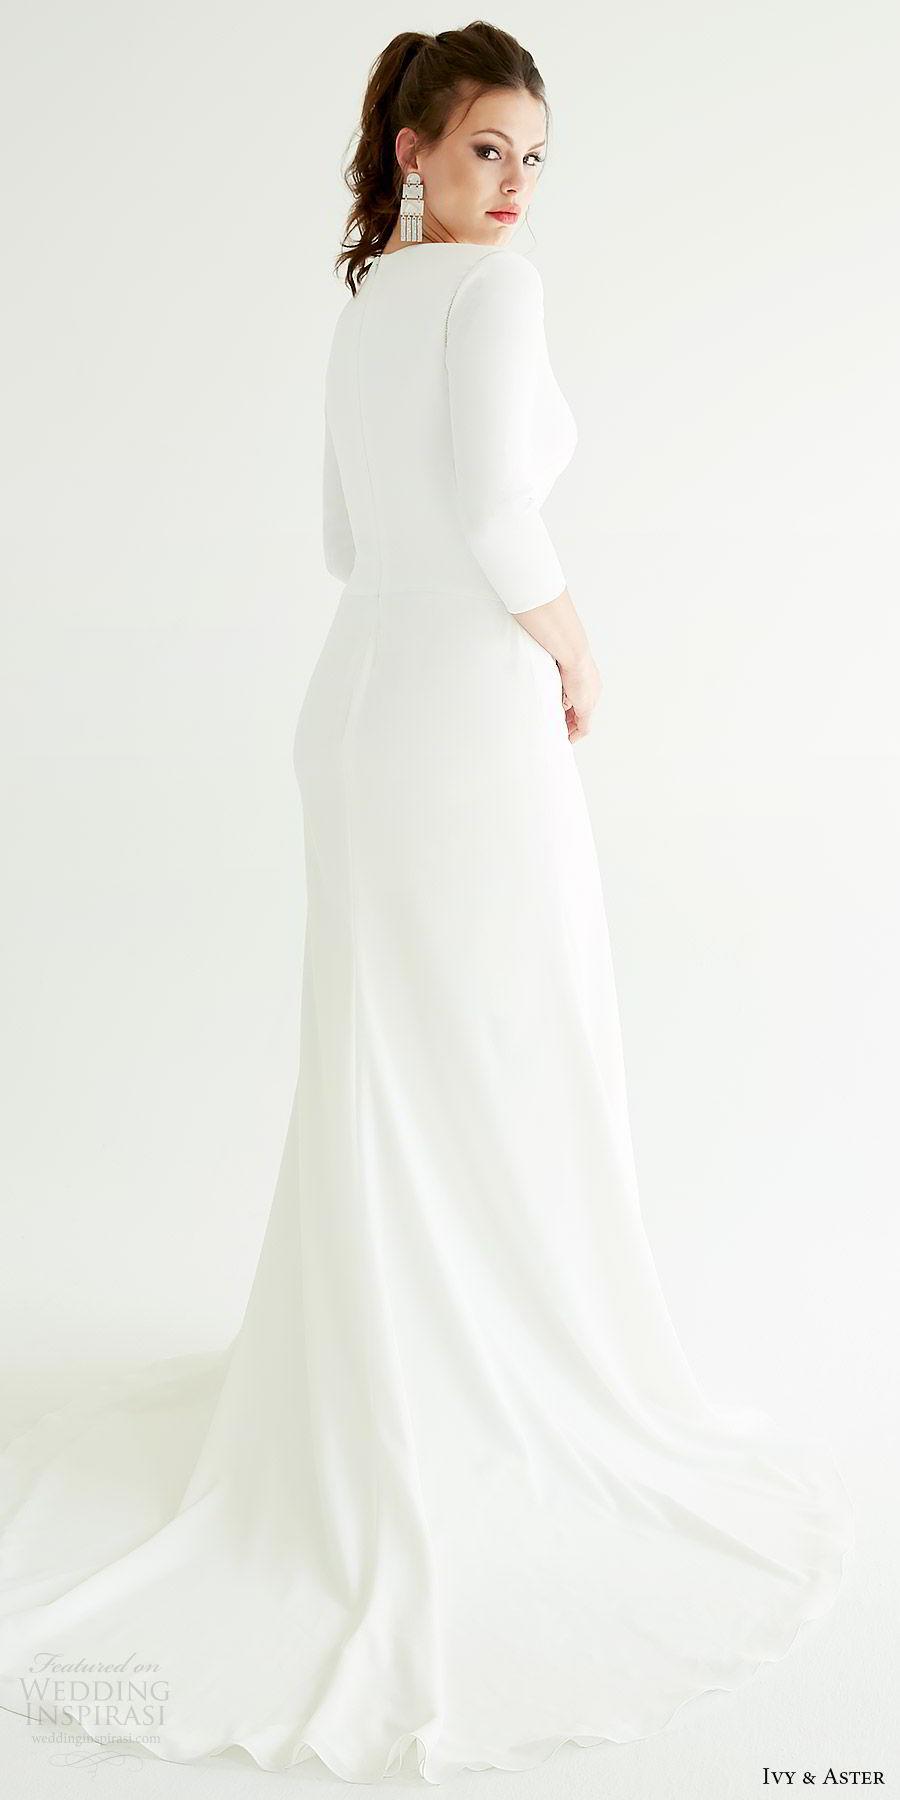 ivy aster bridal 2019 3 quarter sleeve deep v neck minimal sheath wedding dress (graham) bv sweep train elegant clean modern